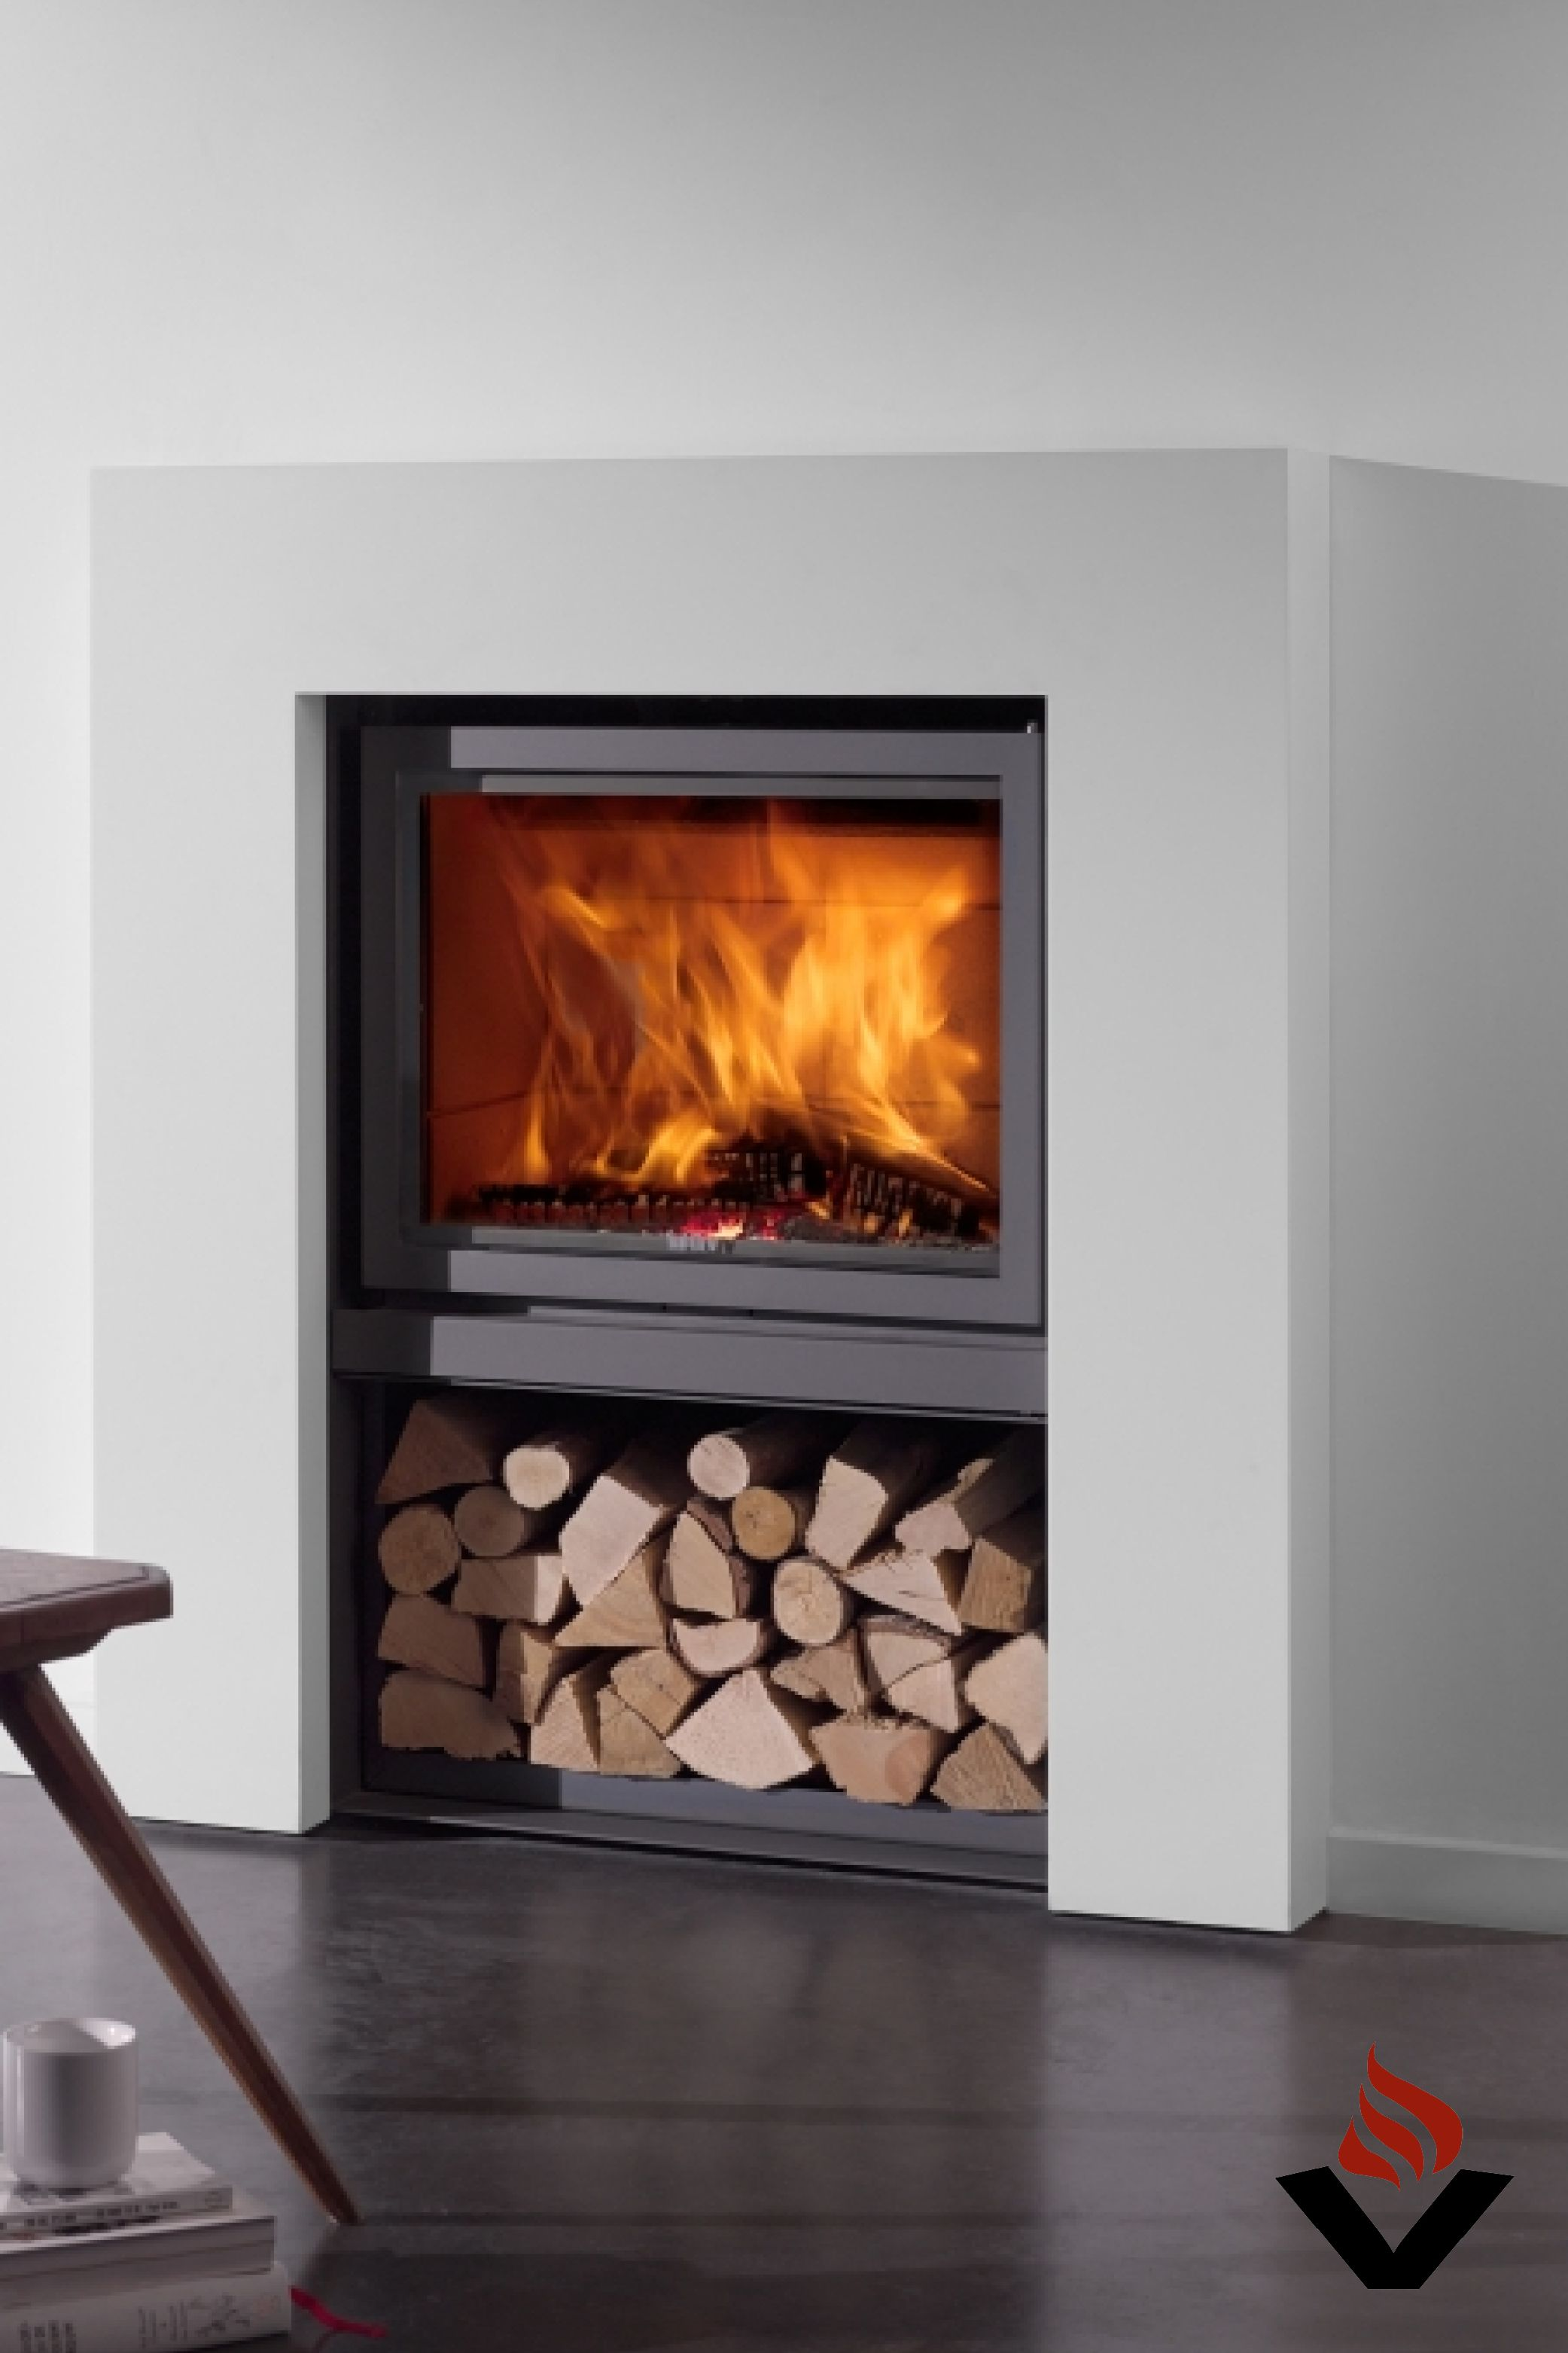 Stuv 16 Wood Zero Clearance Fireplace In 2021 Wood Fireplace Zero Clearance Fireplace Fireplace